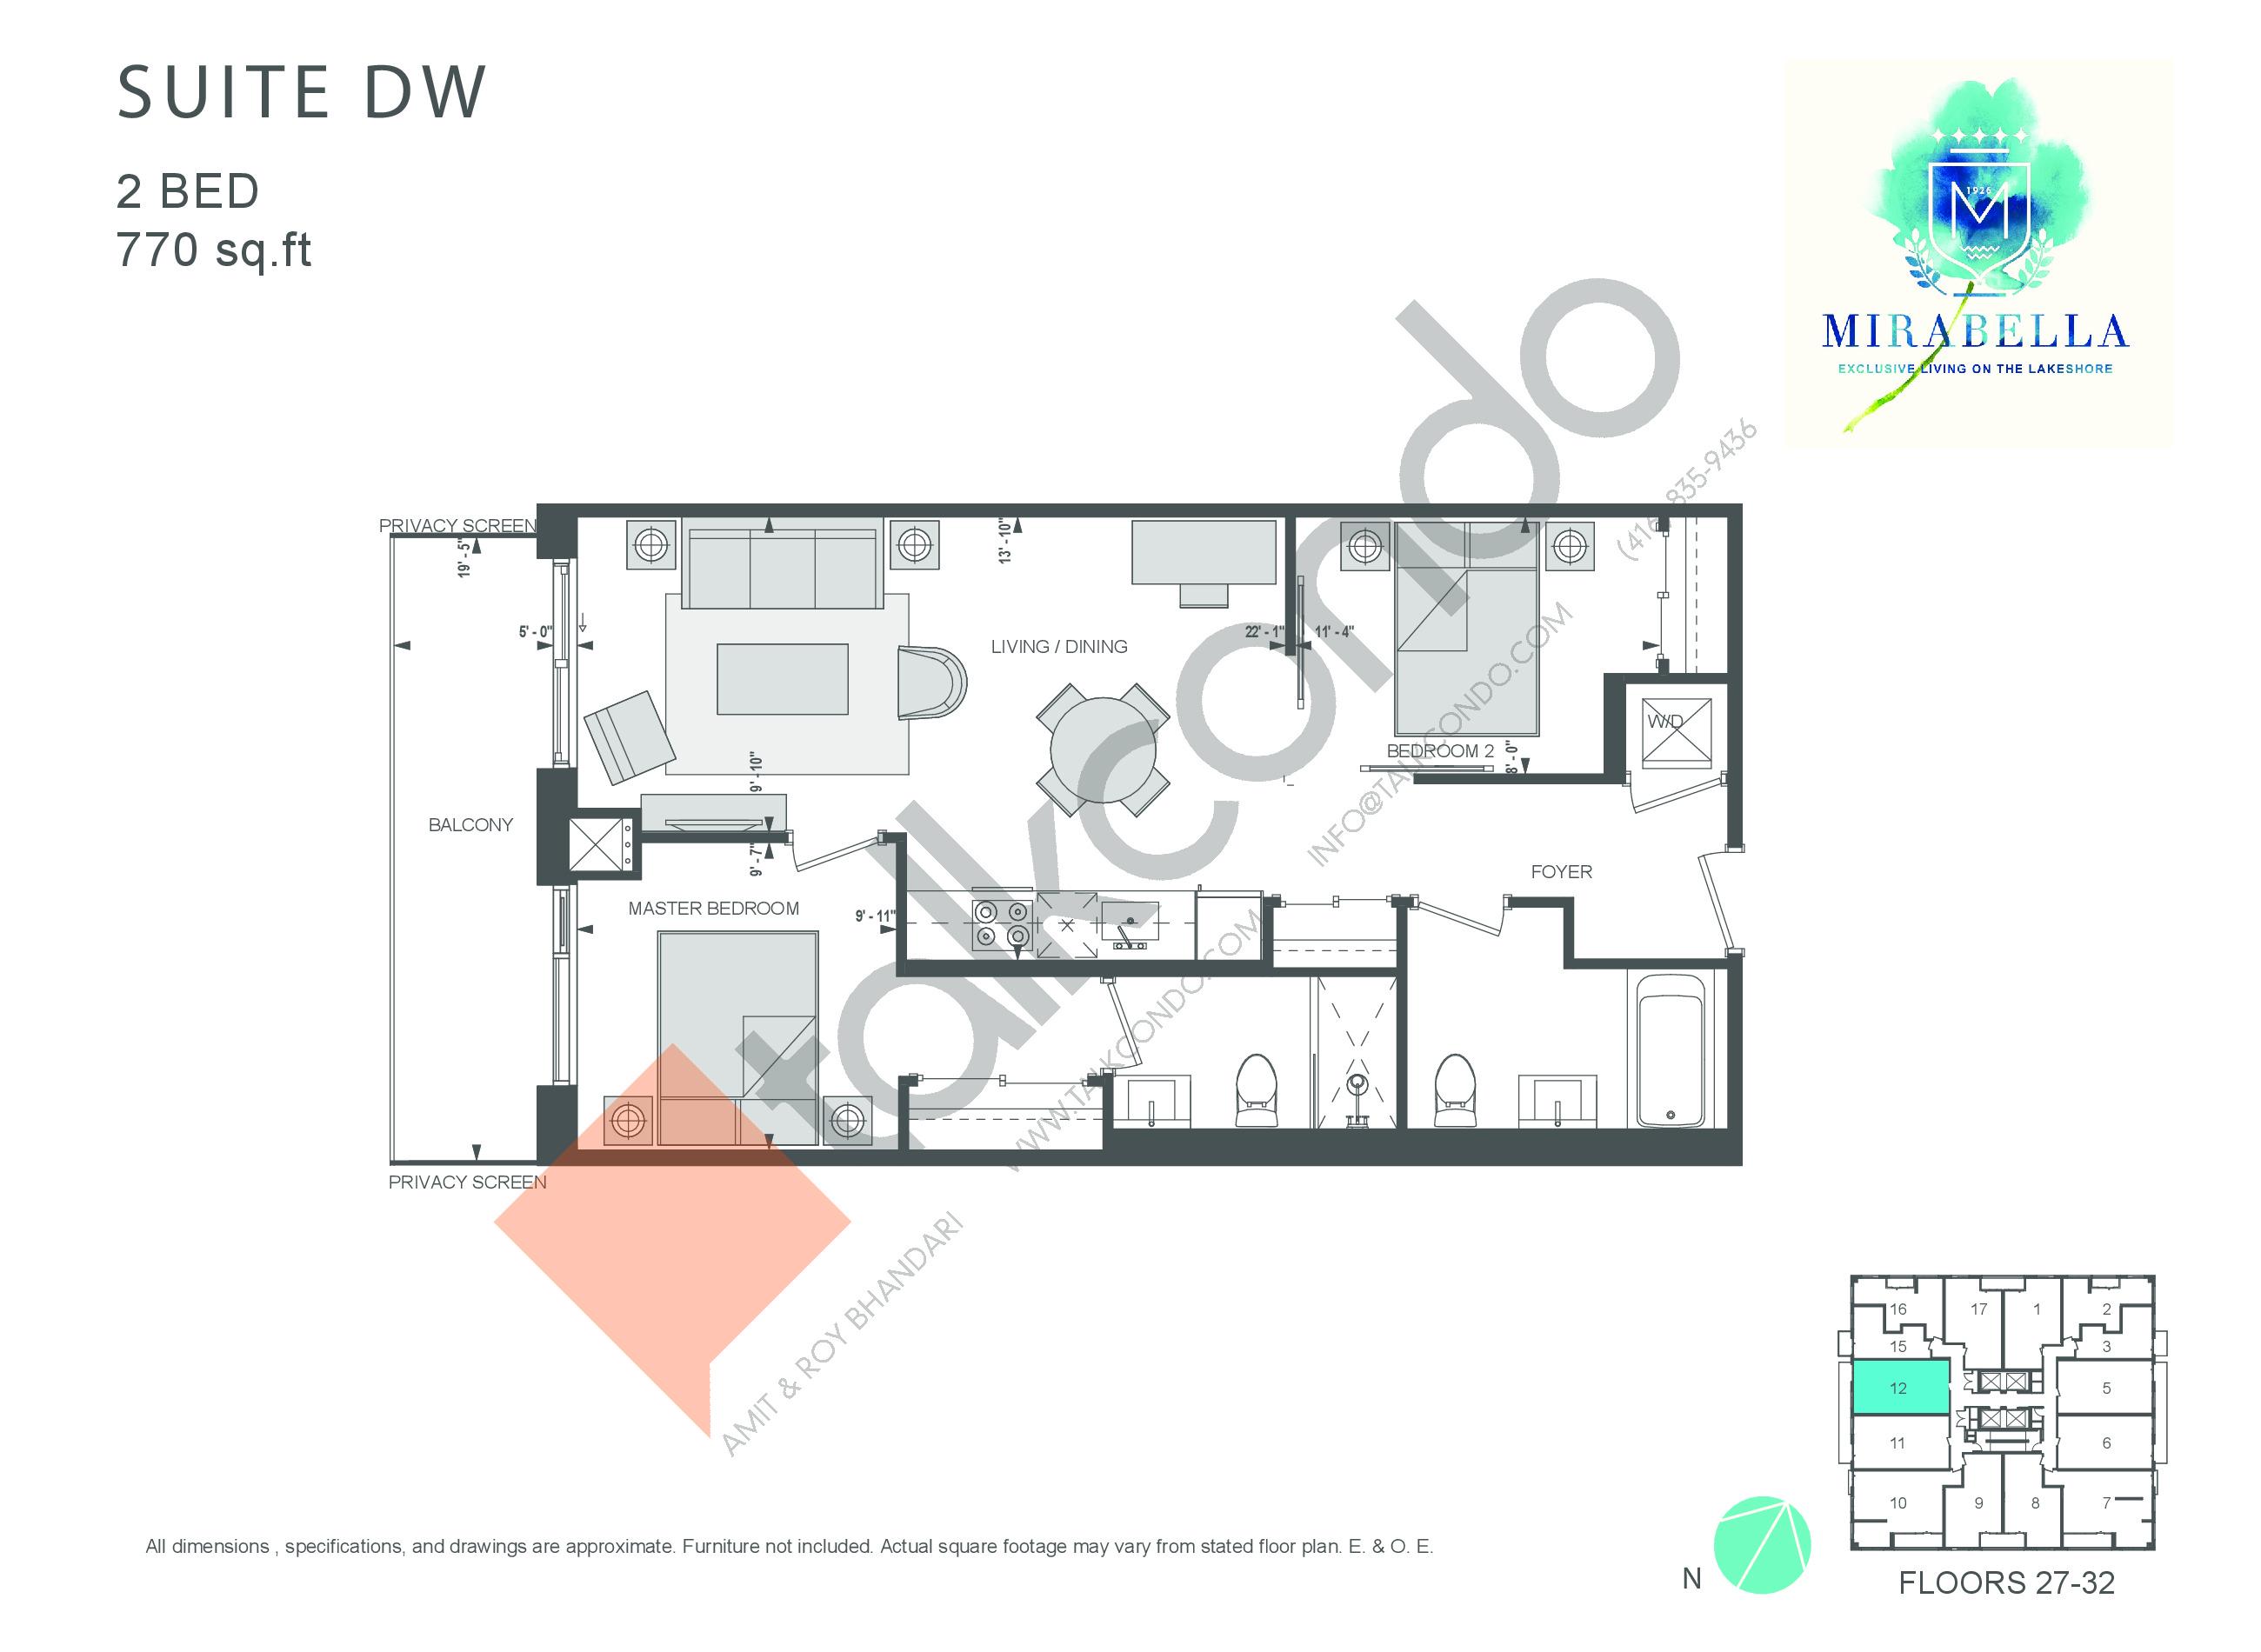 Suite DW Floor Plan at Mirabella Luxury Condos East Tower - 770 sq.ft